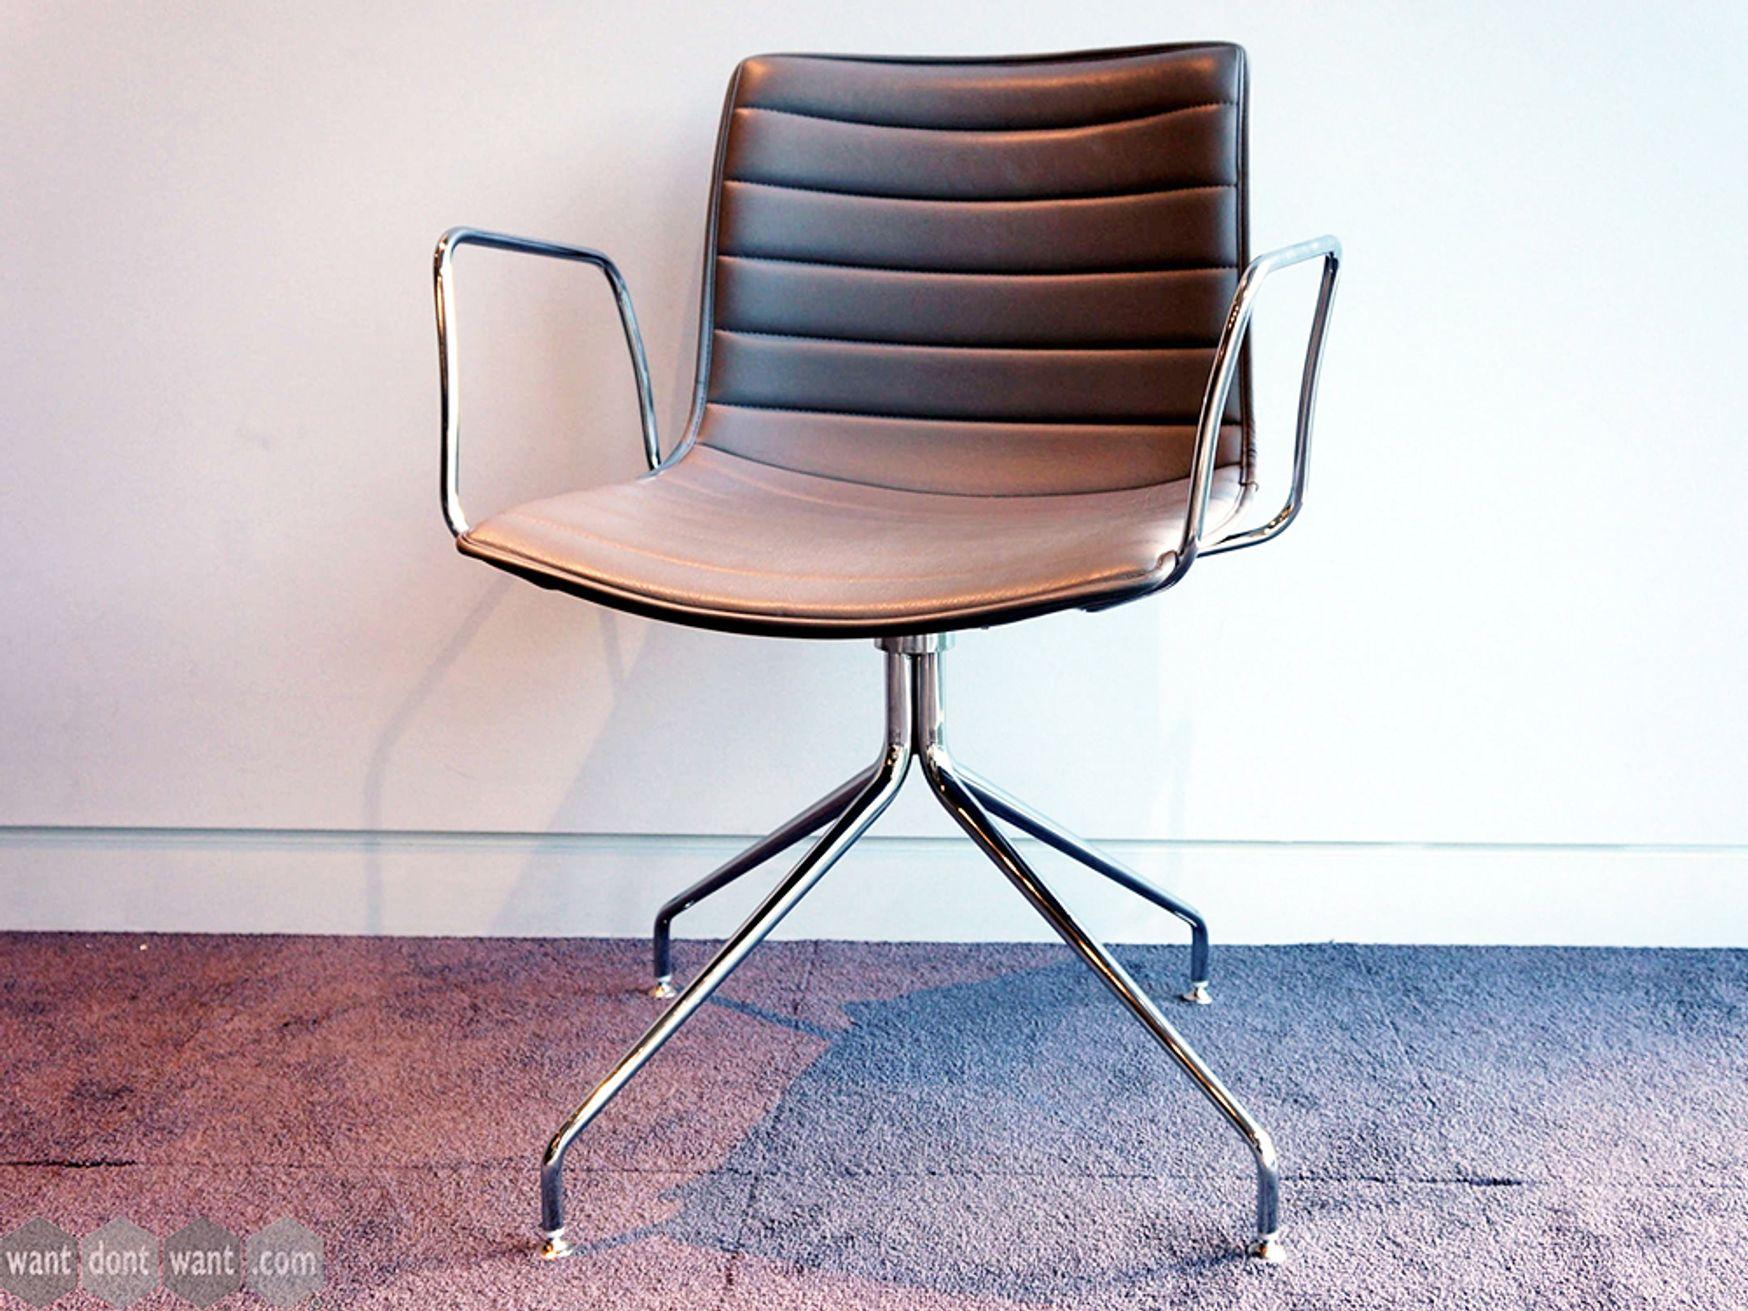 Used Arper Catifa 46 Trestle Swivel Chairs in Grey